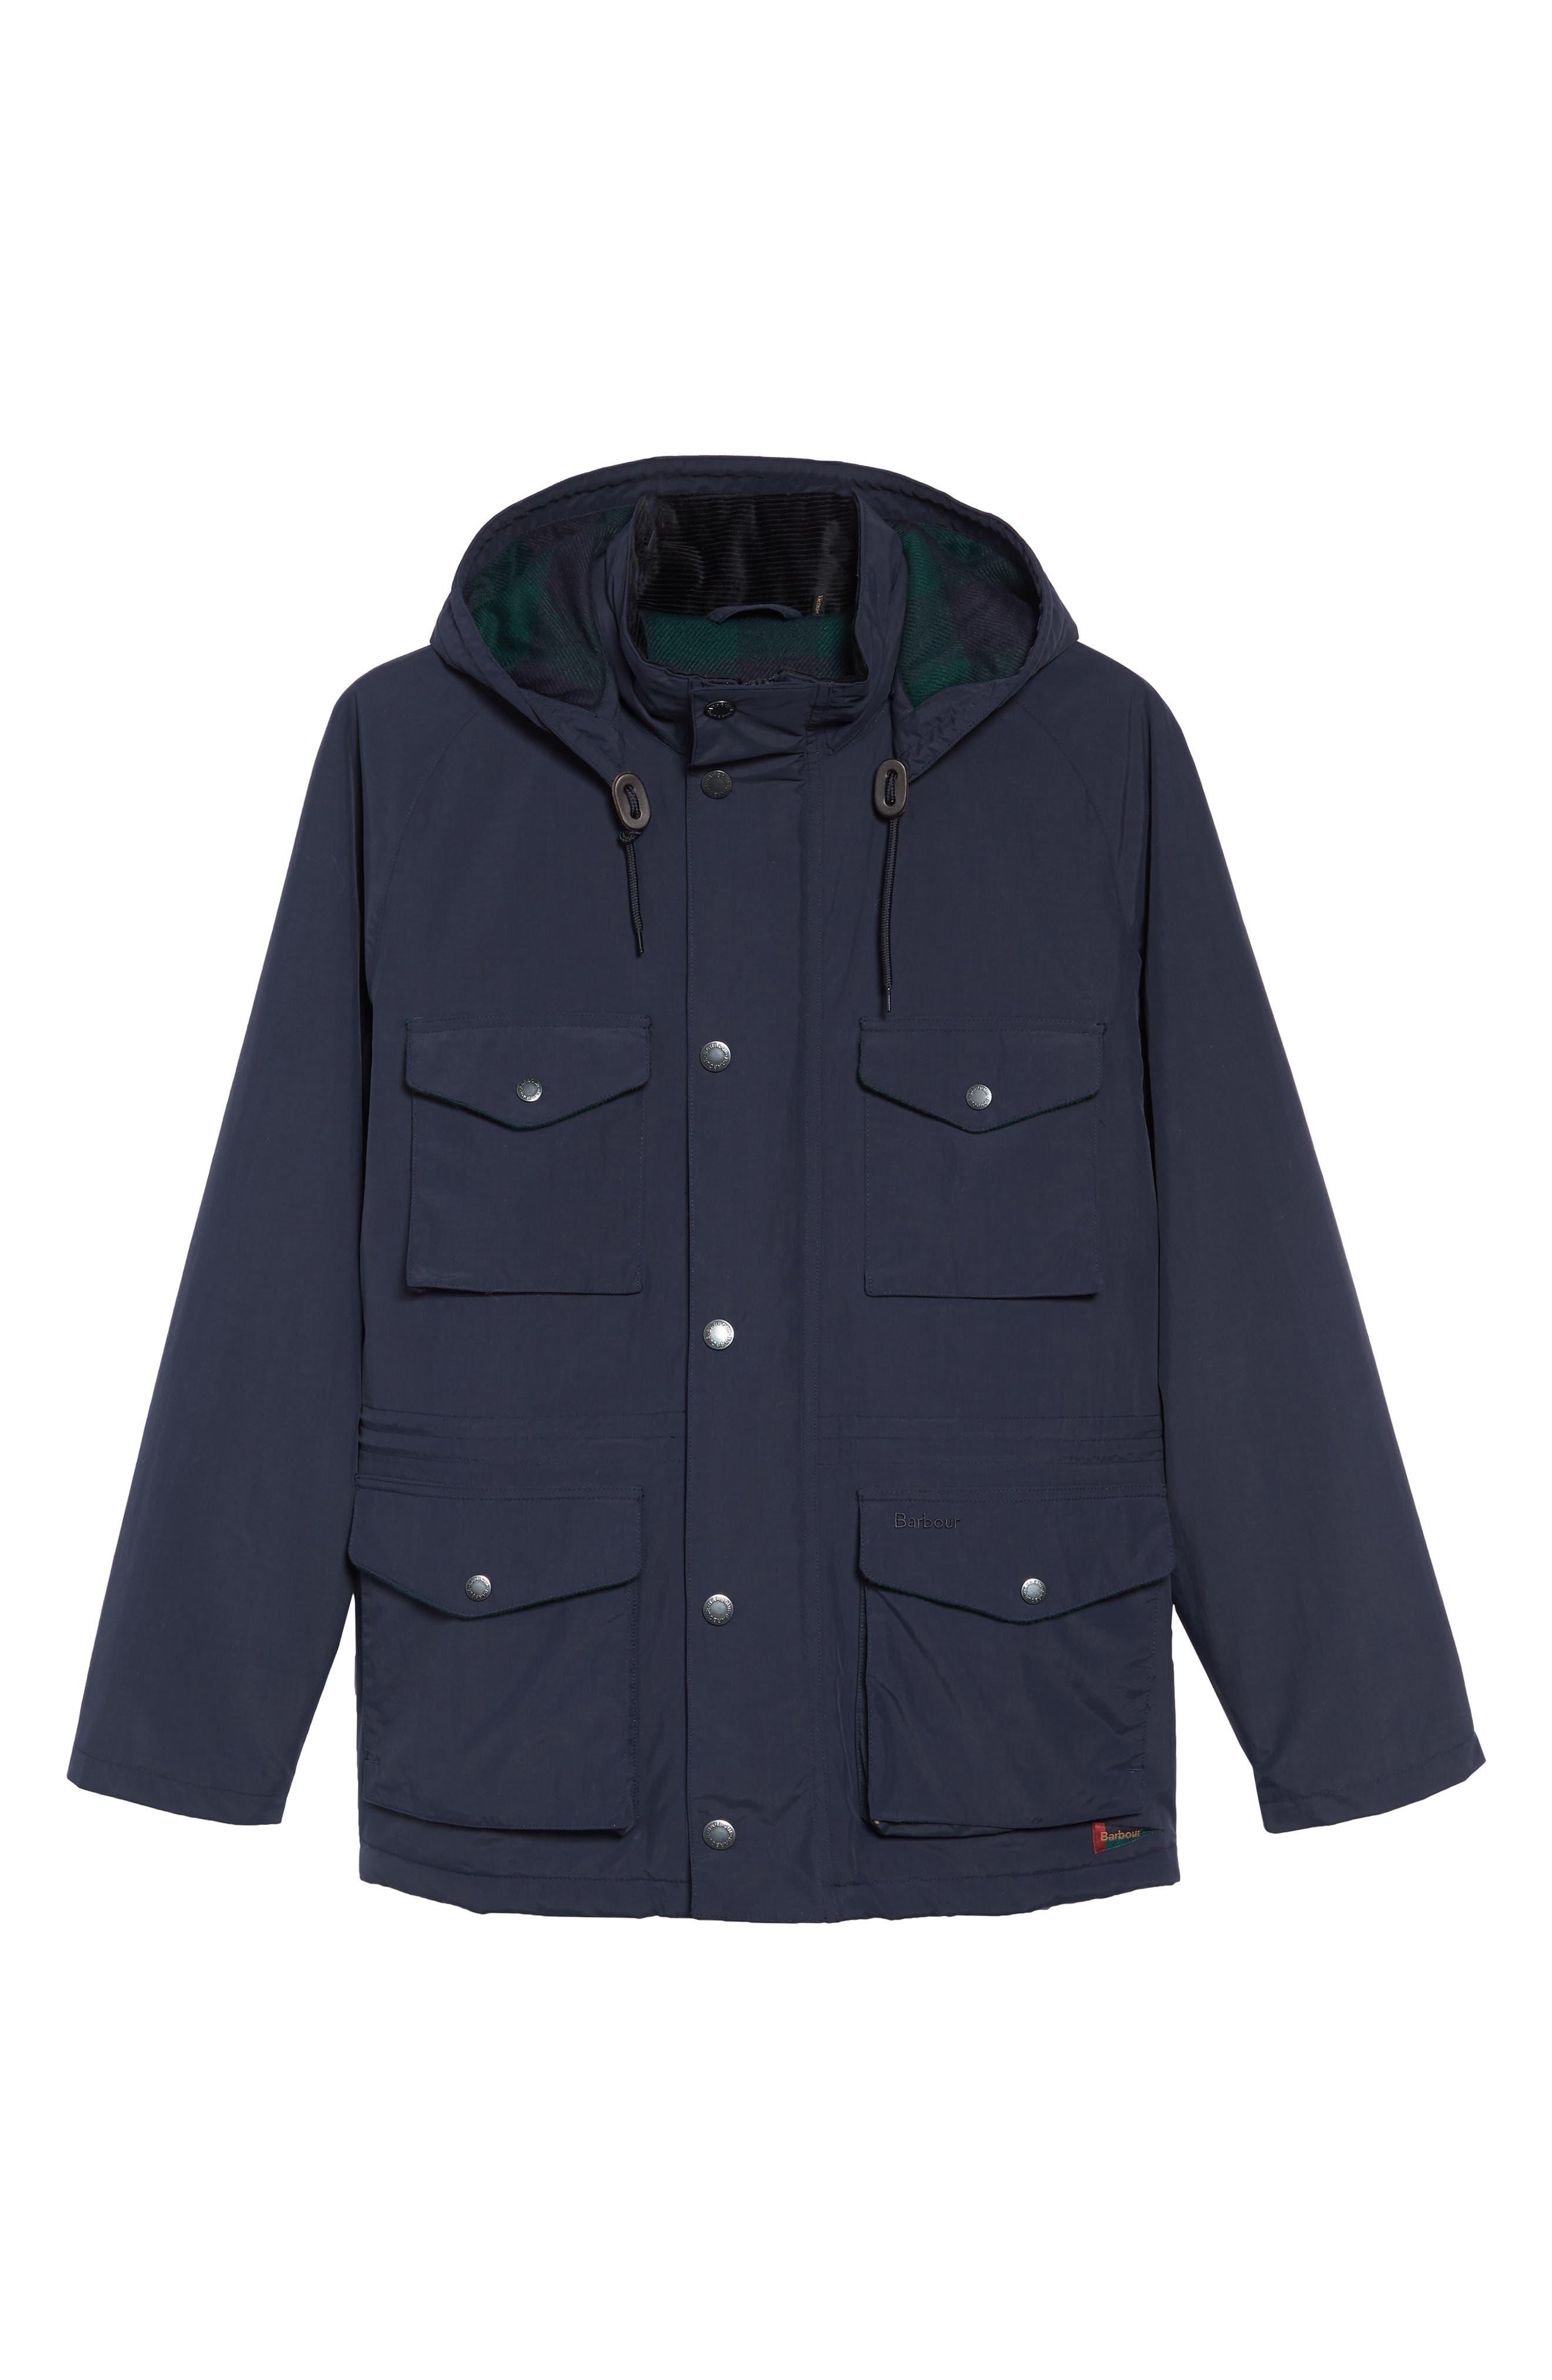 BARBOUR, Tiree Waterproof Jacket, Alternate thumbnail 5, color, 410